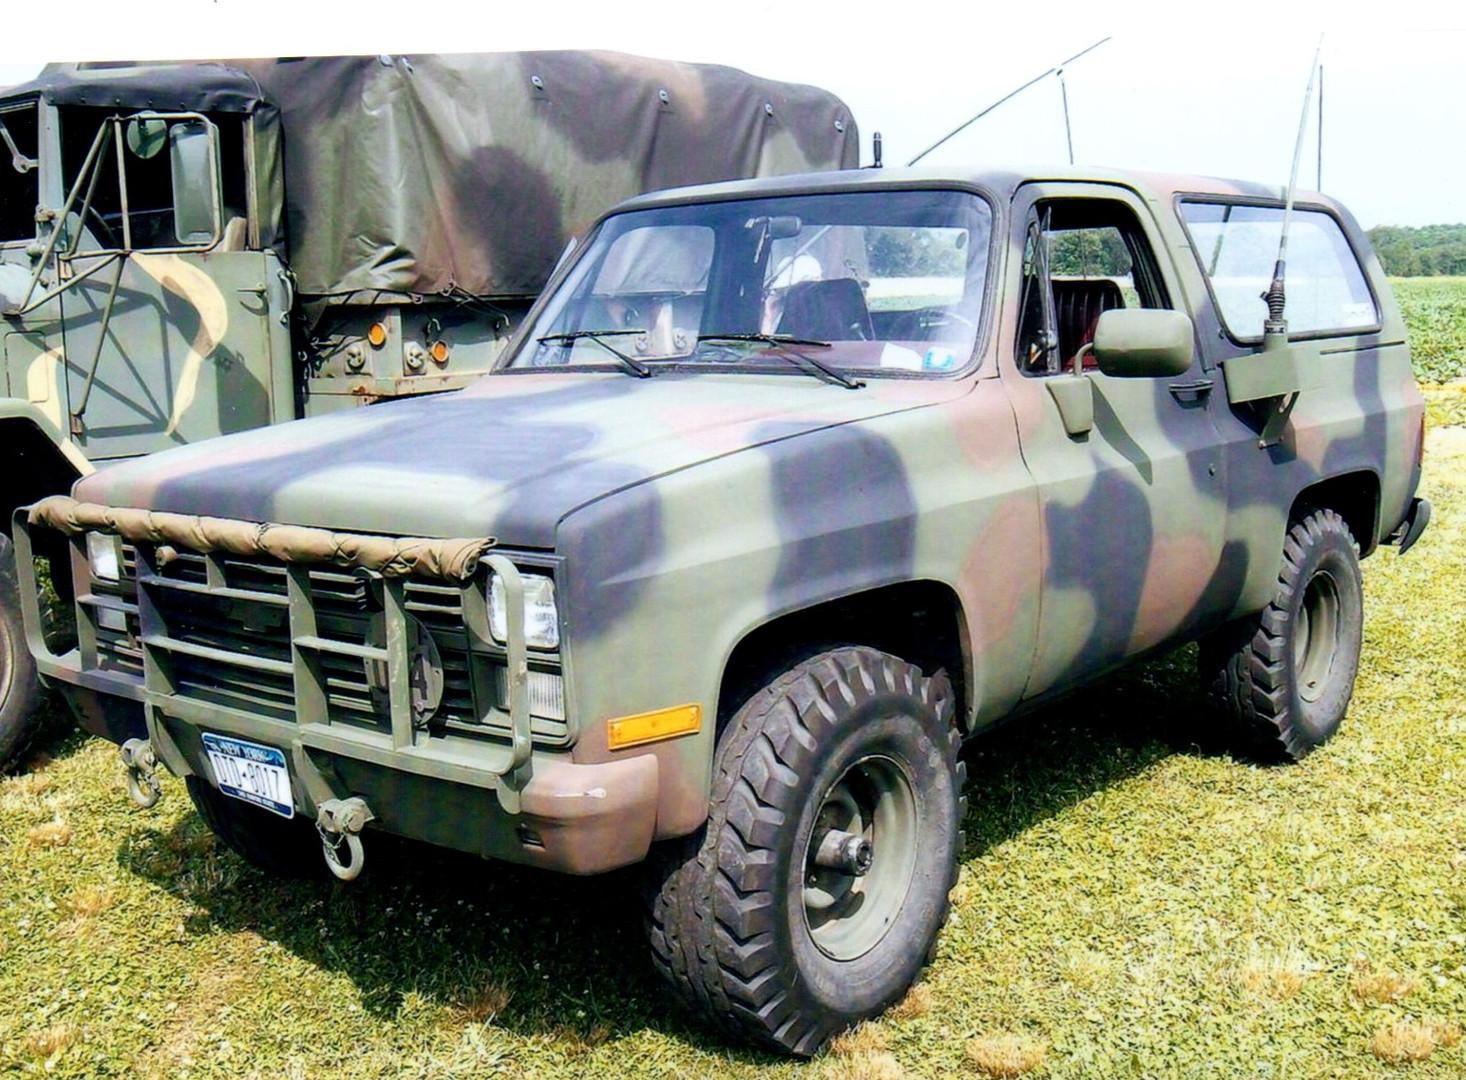 1985 Chevrolet Military Blazer - Fred Silver-Smith